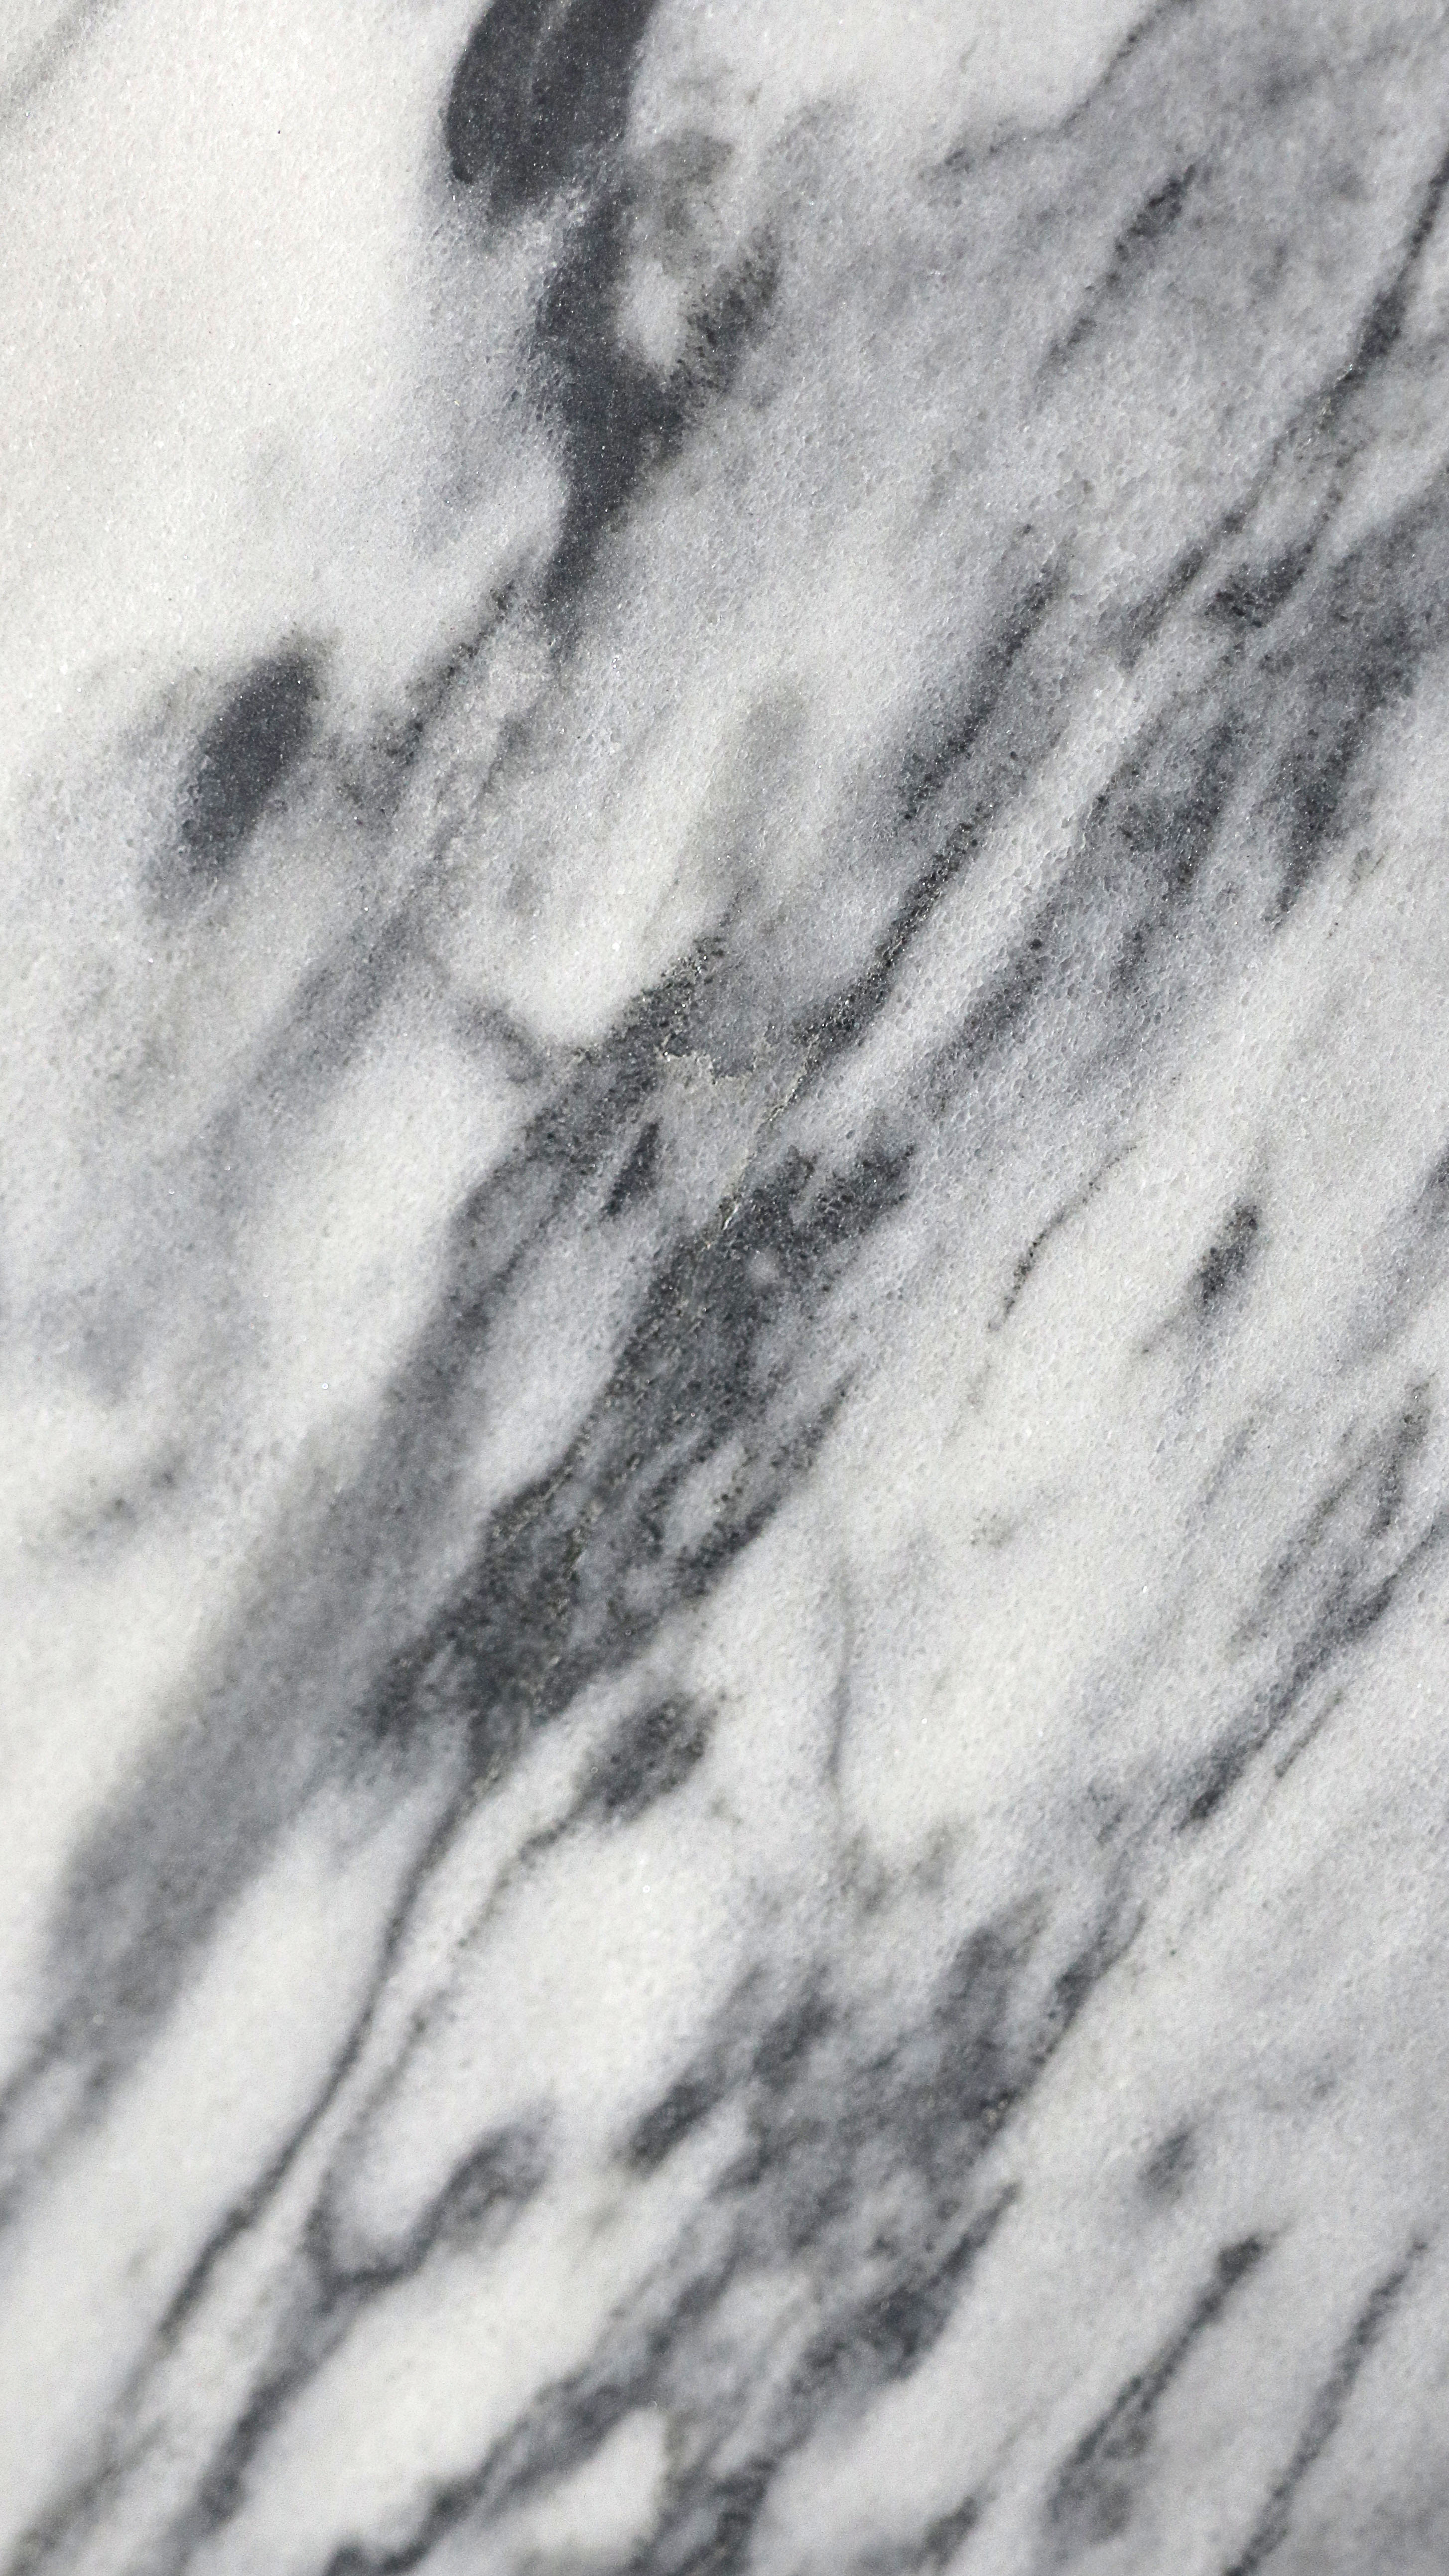 WHITE SOAPSTONE